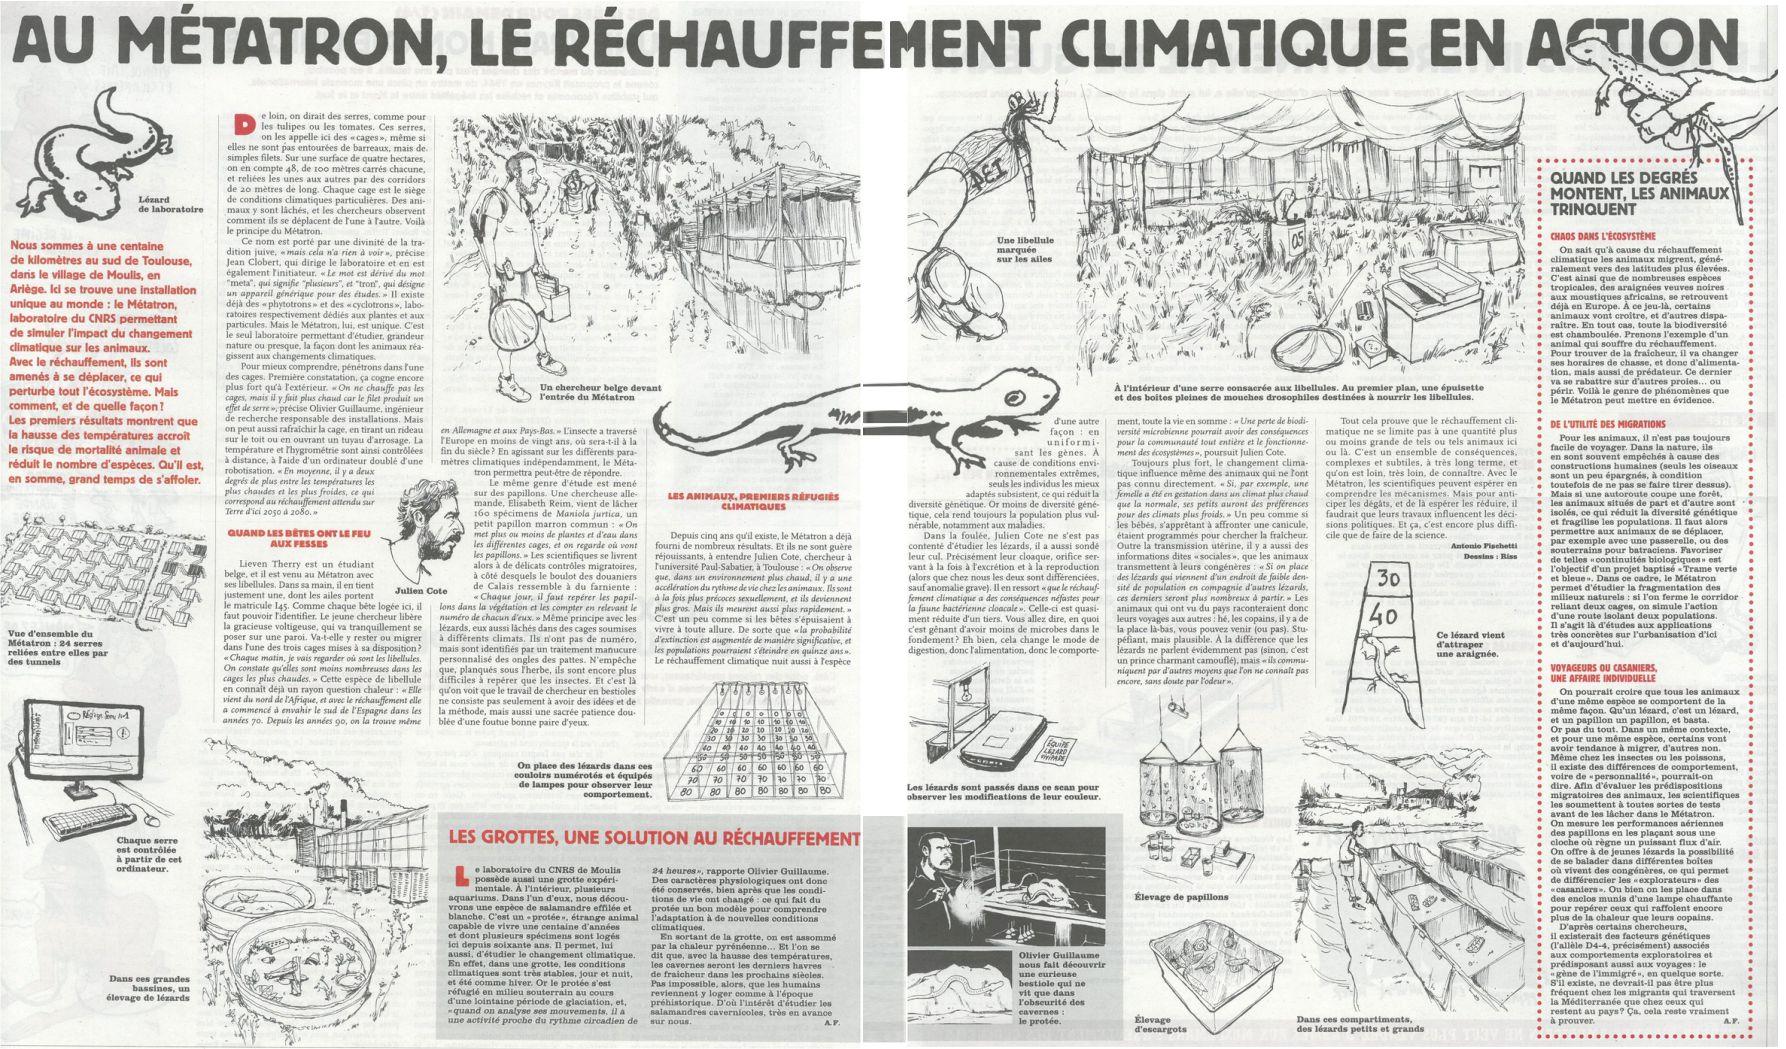 LeRéchauffementClimatiqueEnAction